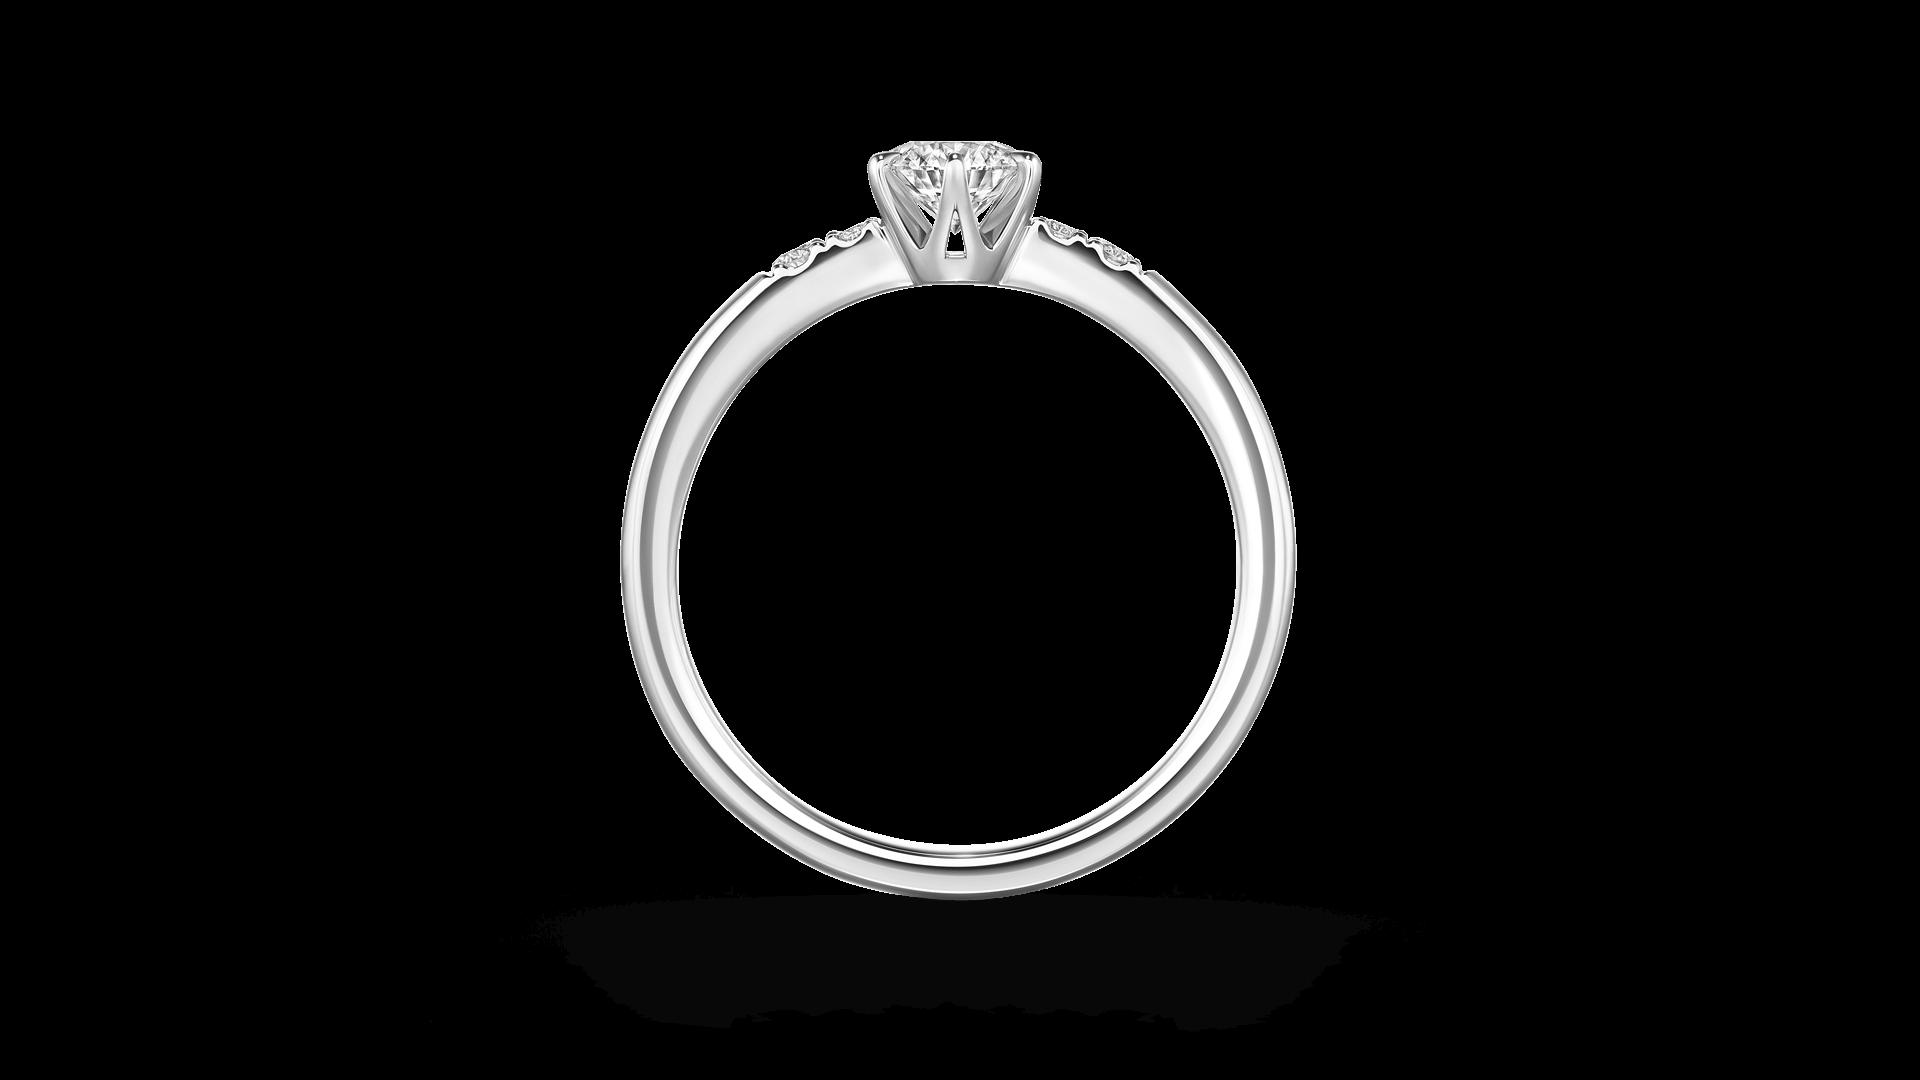 melpe メルーペ≪7月23日(木)発売≫ | 婚約指輪サムネイル 2